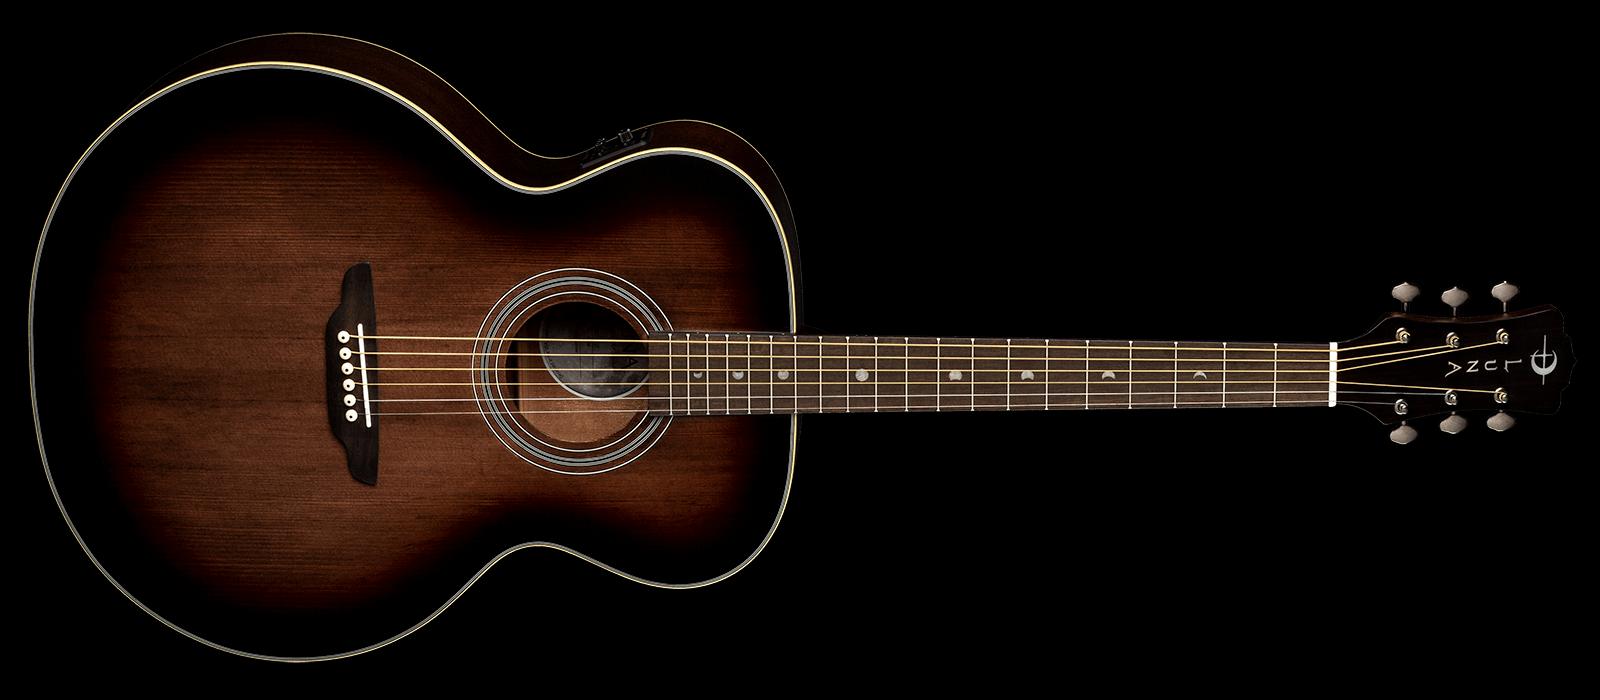 Luna Art Vintage Jumbo Acoustic/Electric Guitar - Solid Top